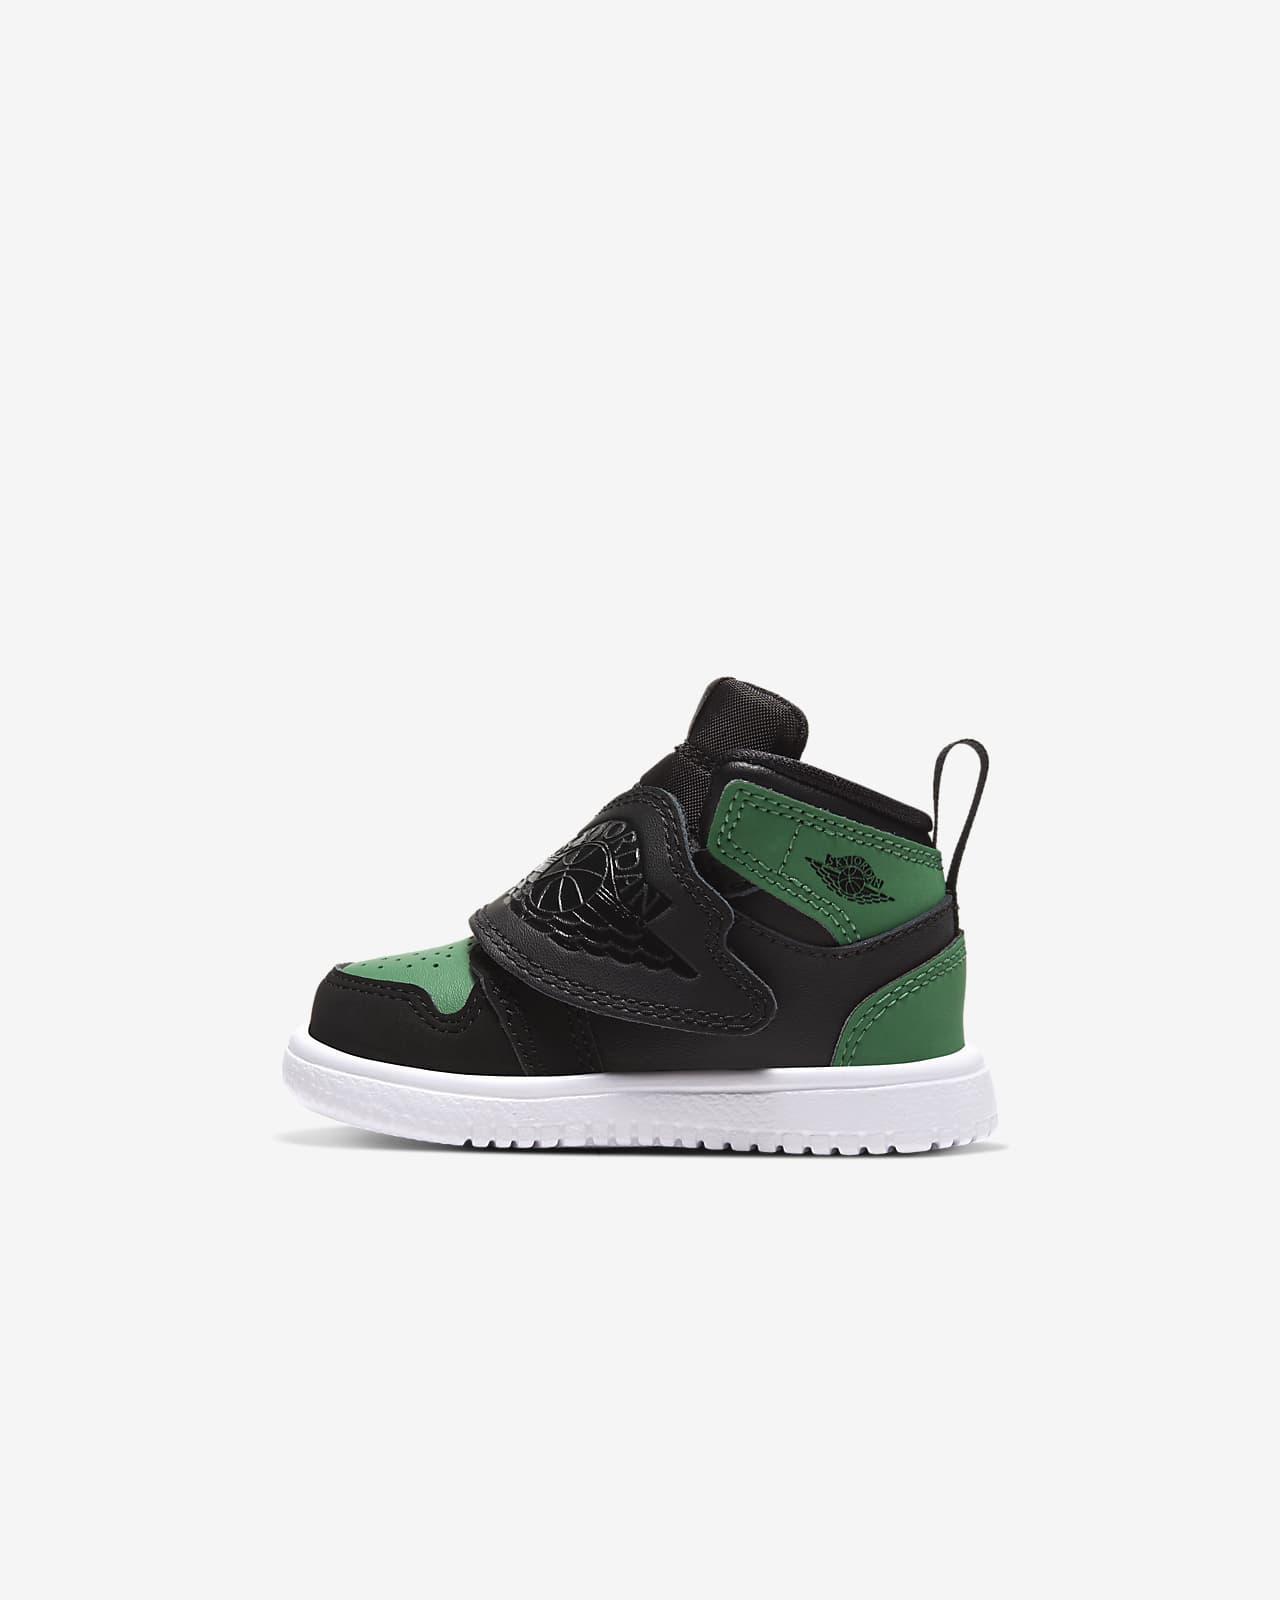 Sky Jordan 1 Baby and Toddler Shoe. Nike NZ